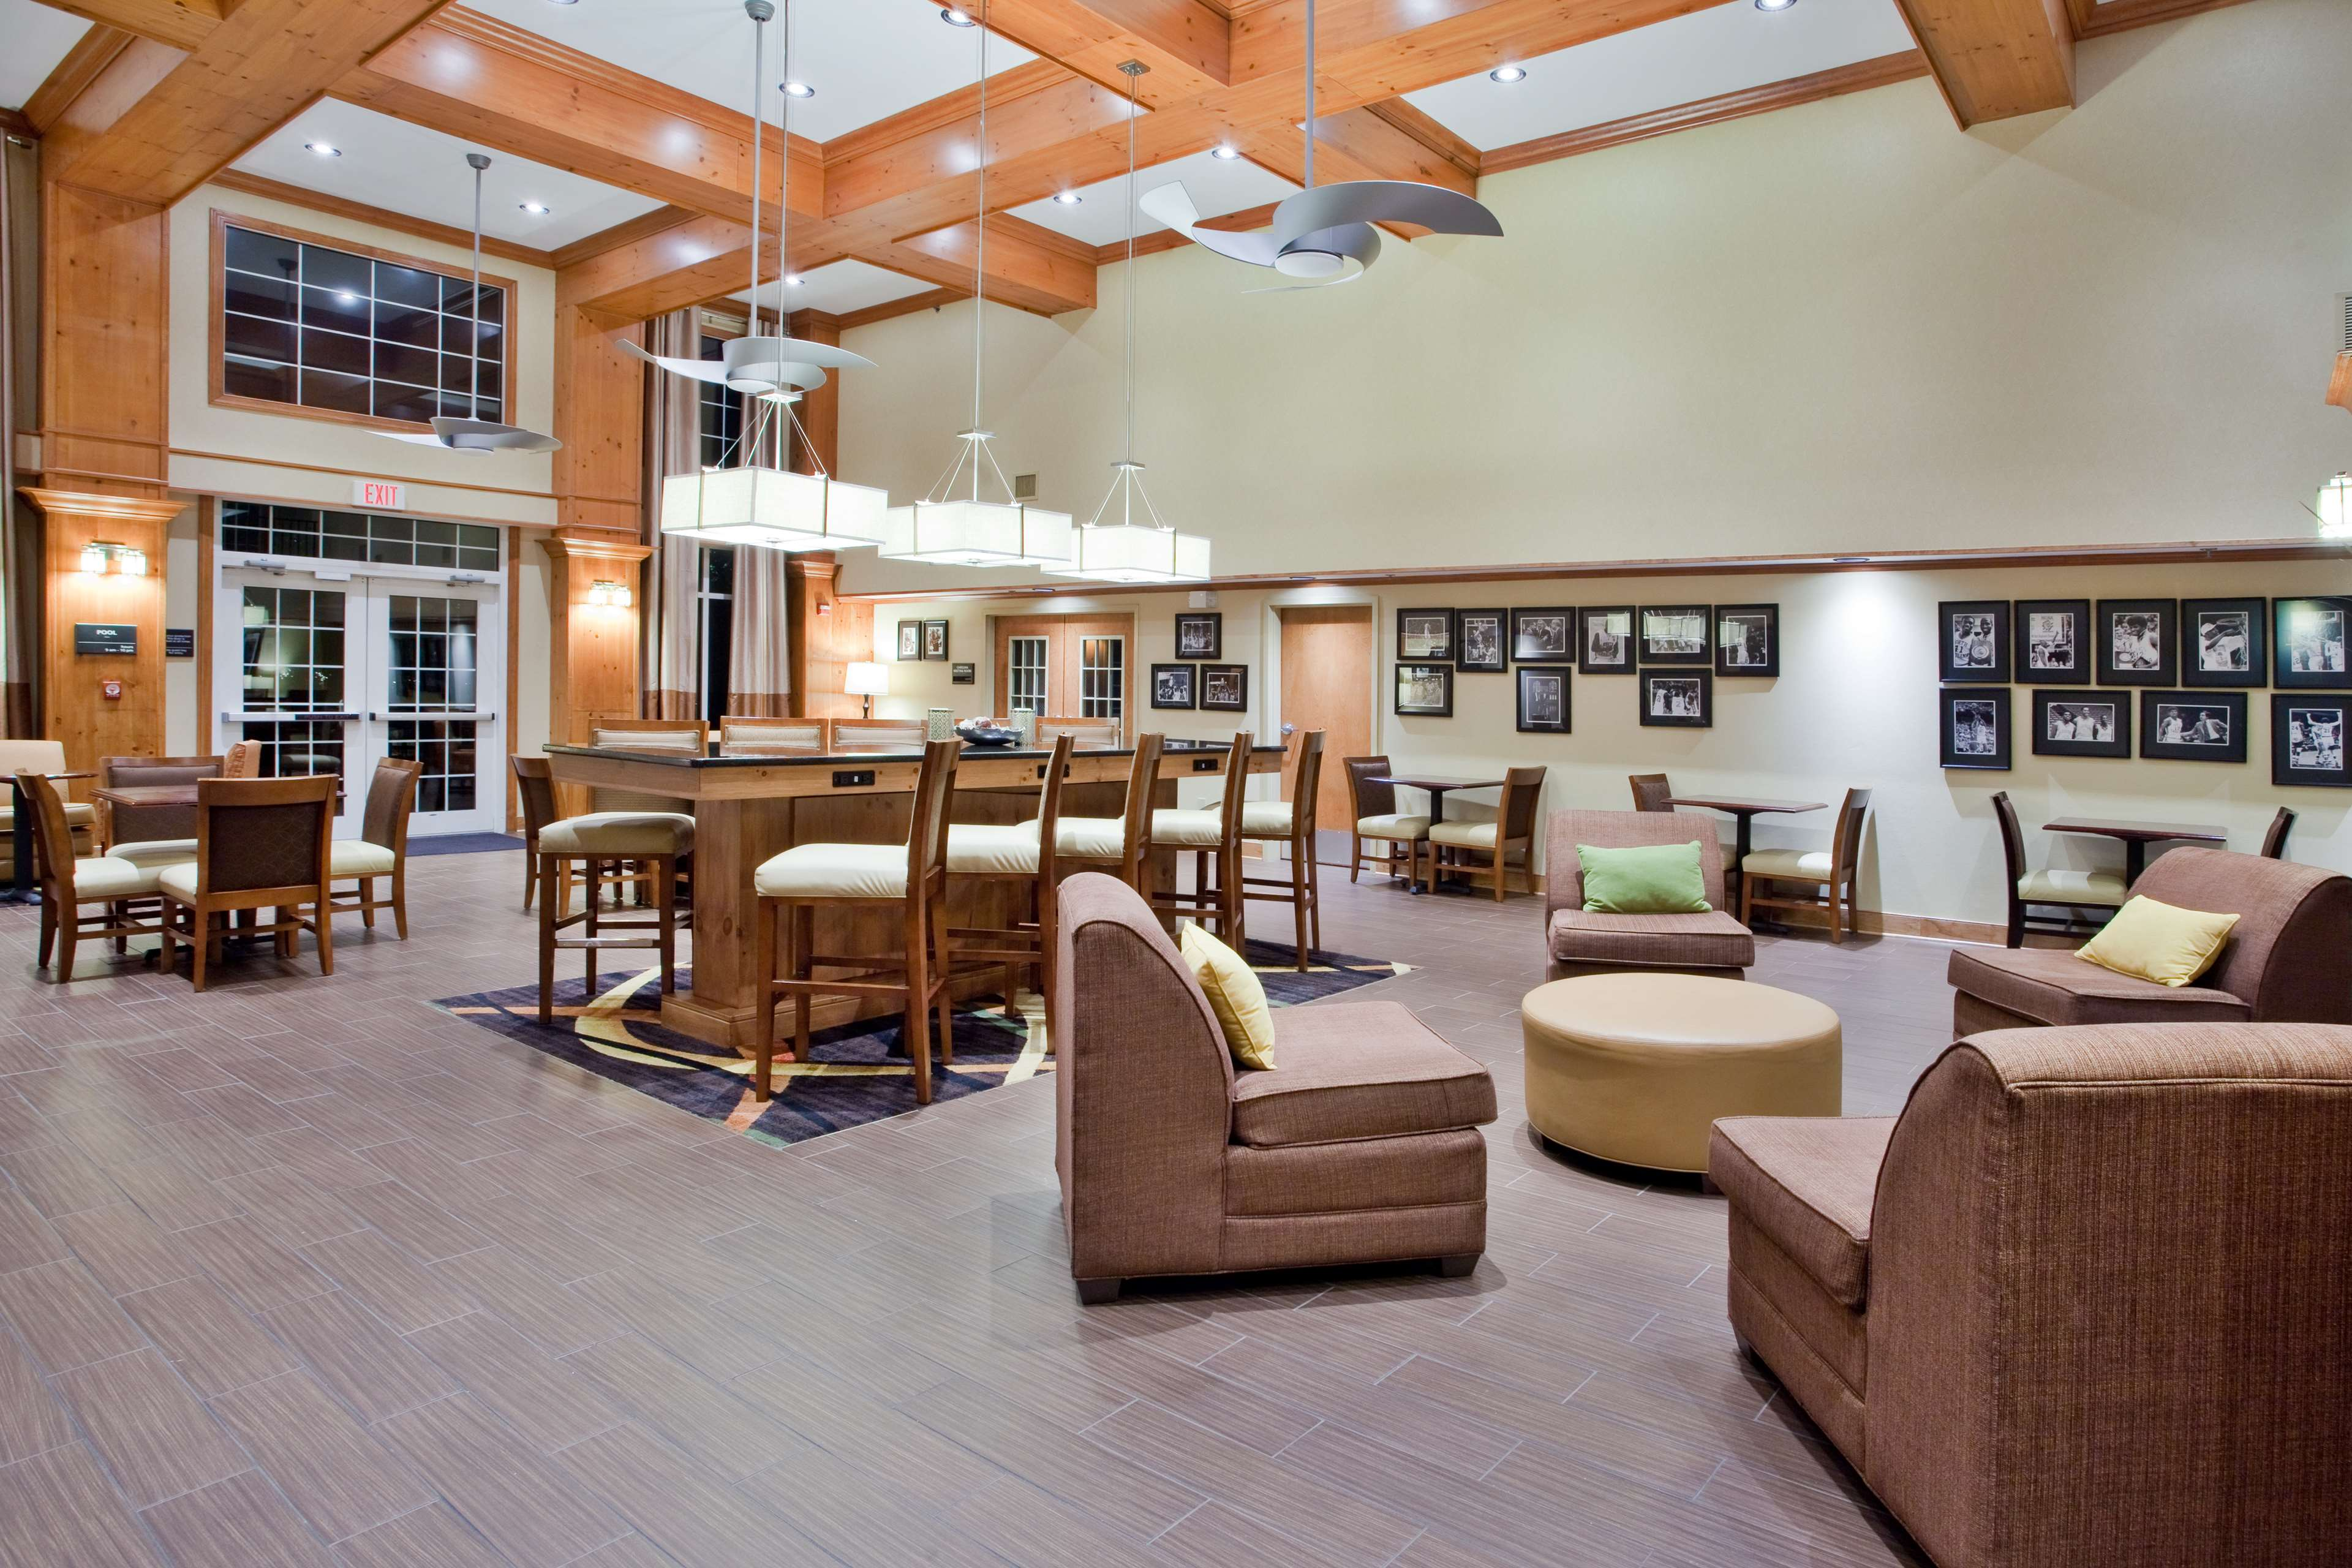 Hampton Inn & Suites Chapel Hill/Durham, Area image 5